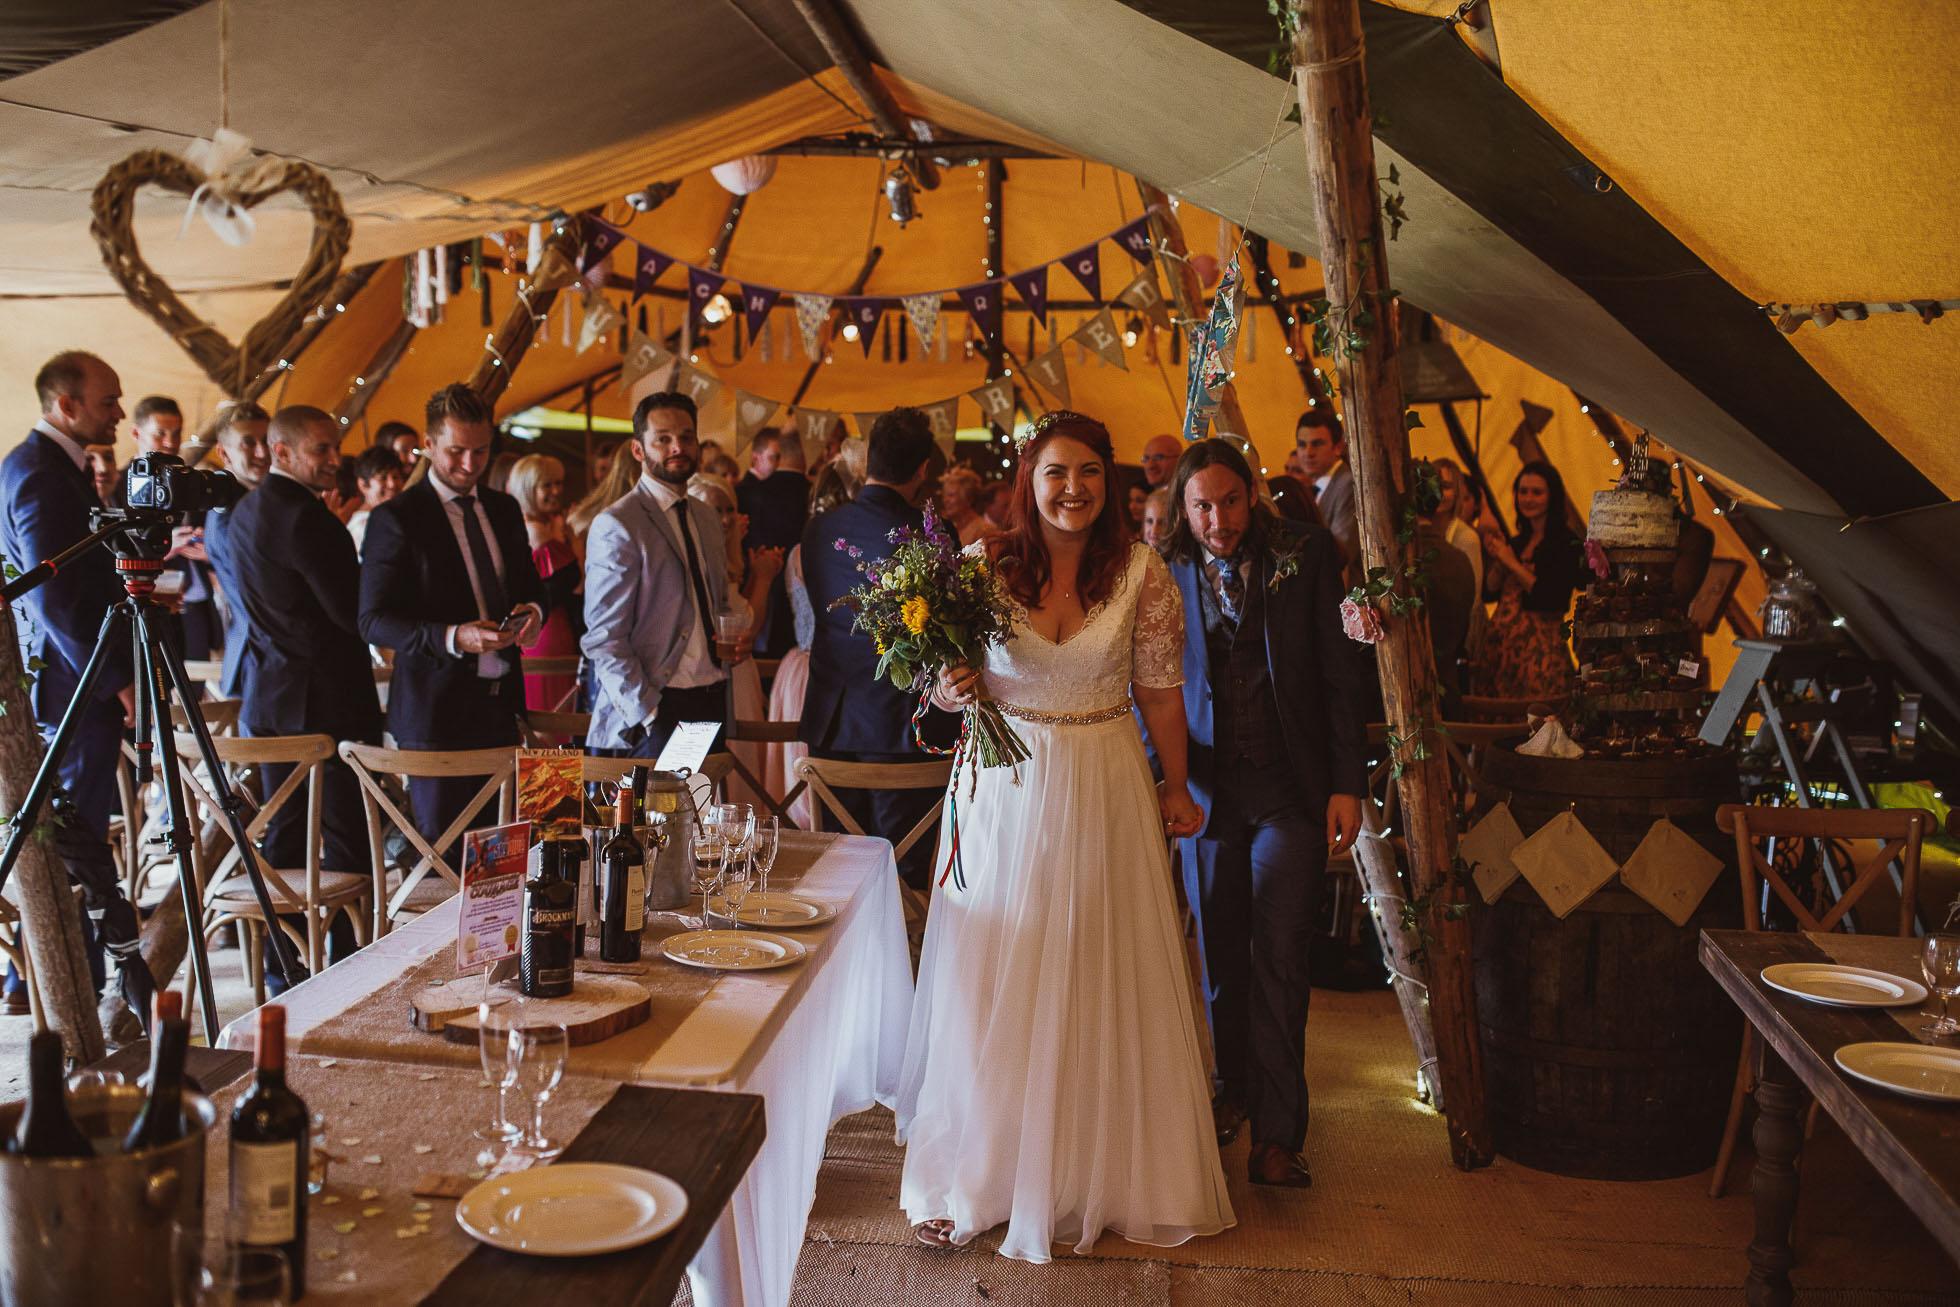 skipbridge_farm_wedding_york-53.jpg